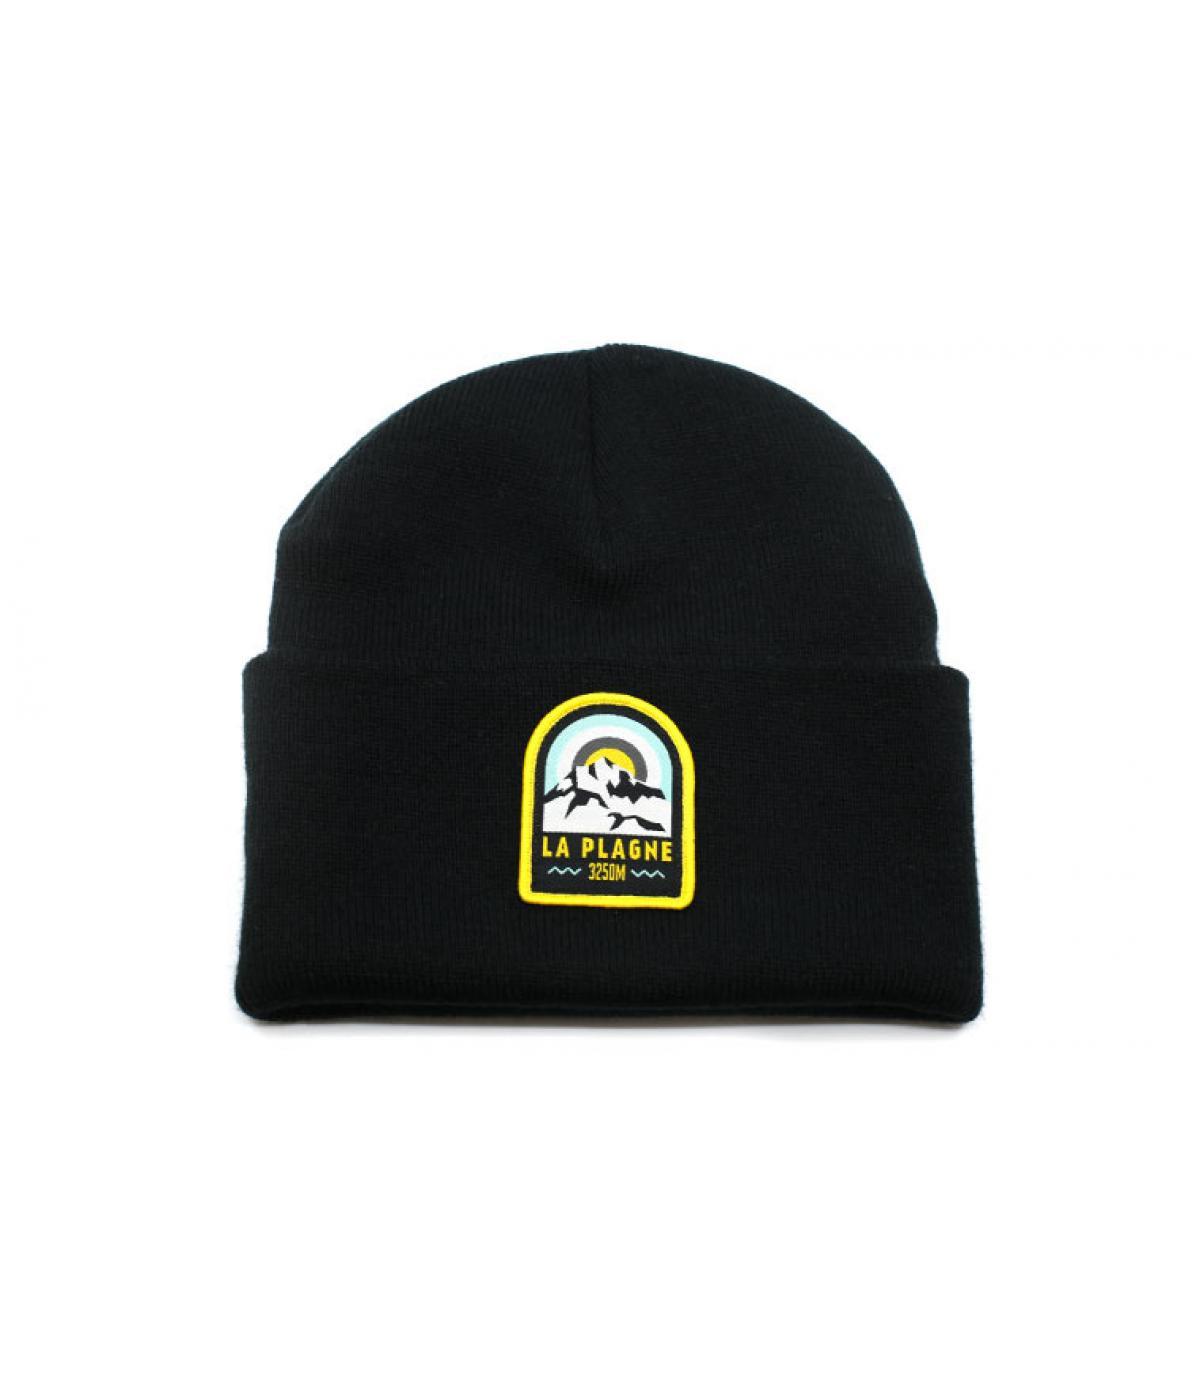 Mütze La Plagne schwarz